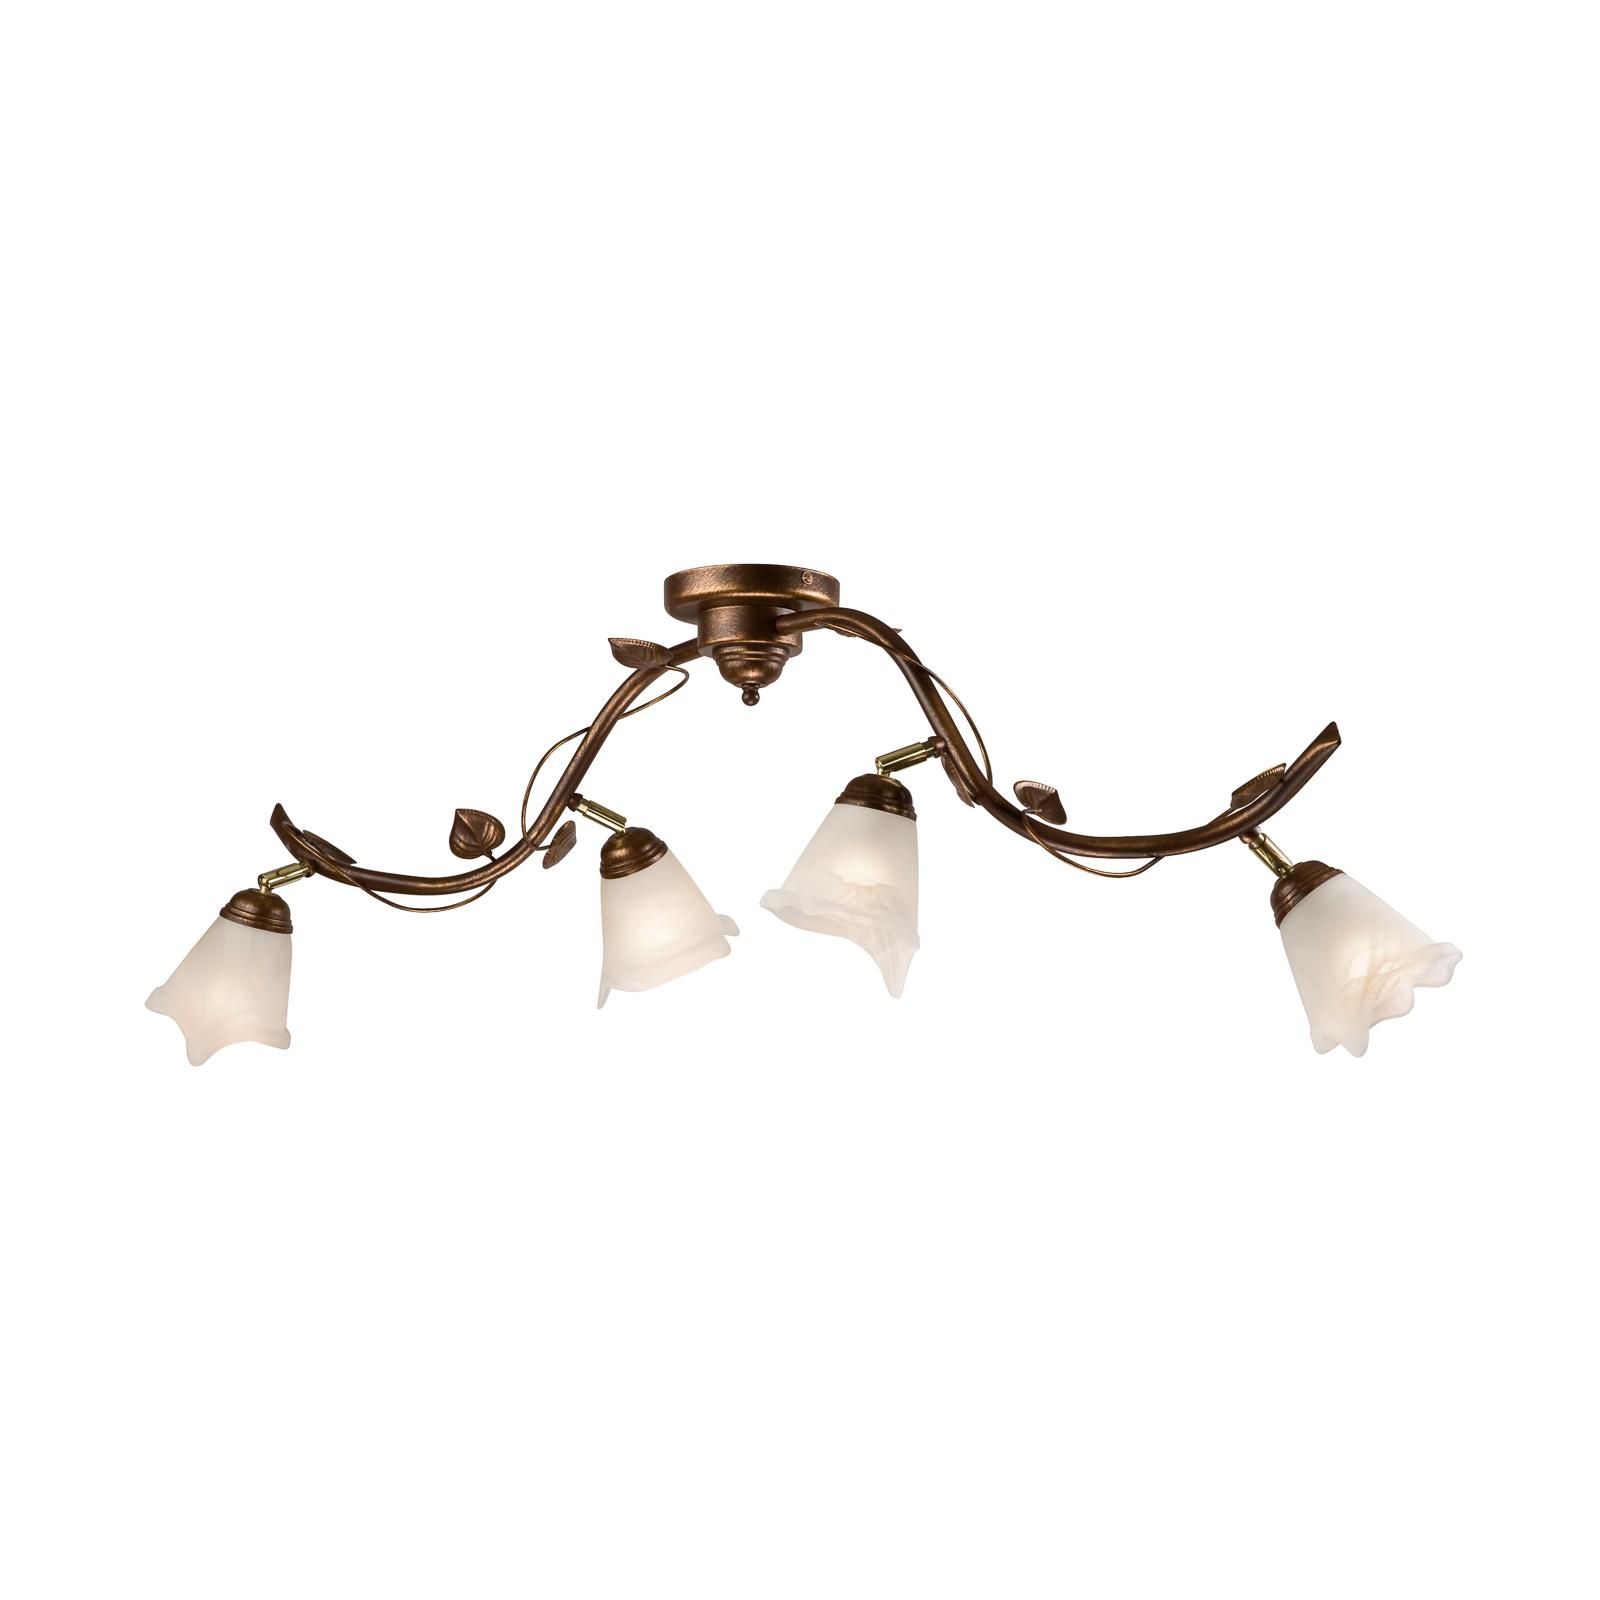 Taklampe Siena florentinstil, 4 lyskilder